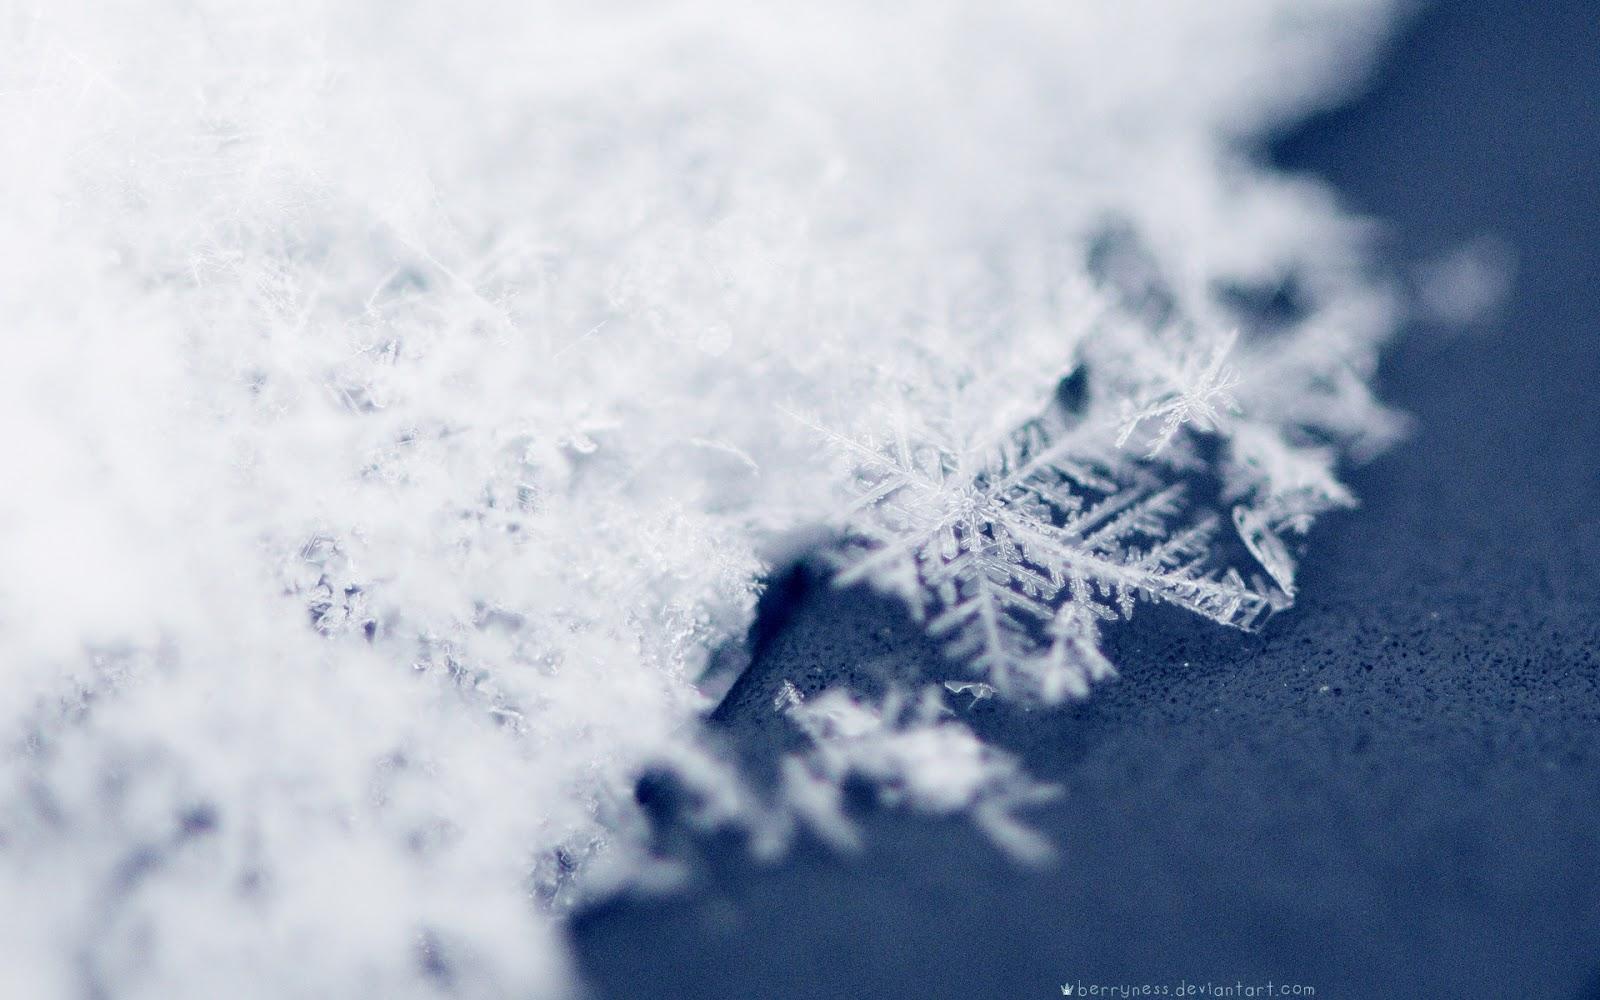 http://1.bp.blogspot.com/-0jXGChi8c9s/ULrthoFWfuI/AAAAAAAACUI/bzn4vkqUDC4/s1600/Winter+Wallpaper+(39).jpg